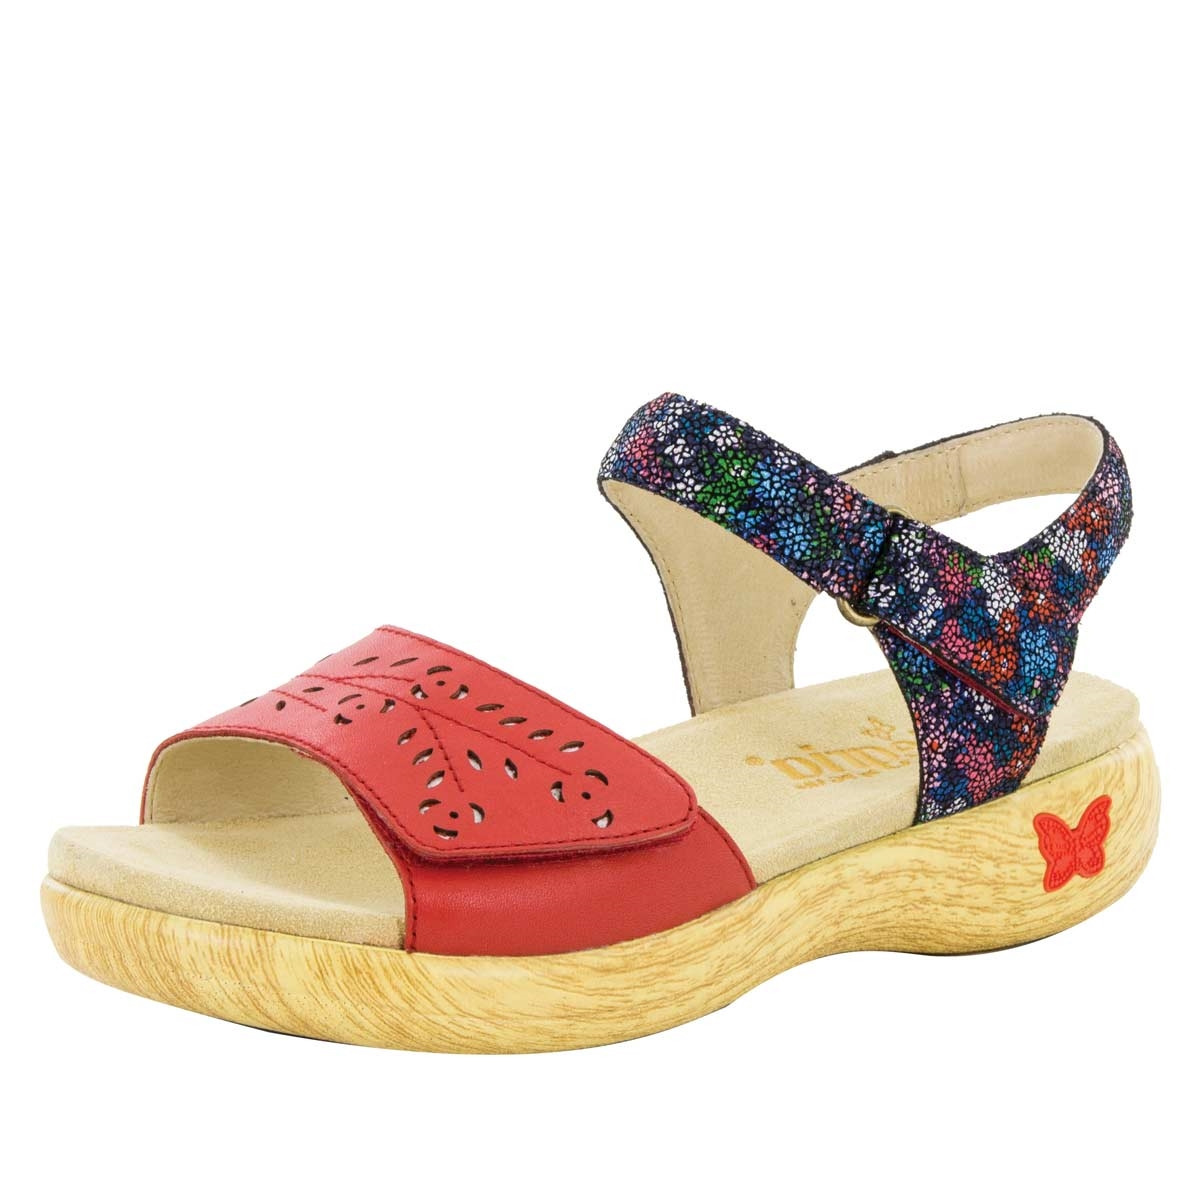 7448066bcca Jesa Botanicool - Alegria Shoes